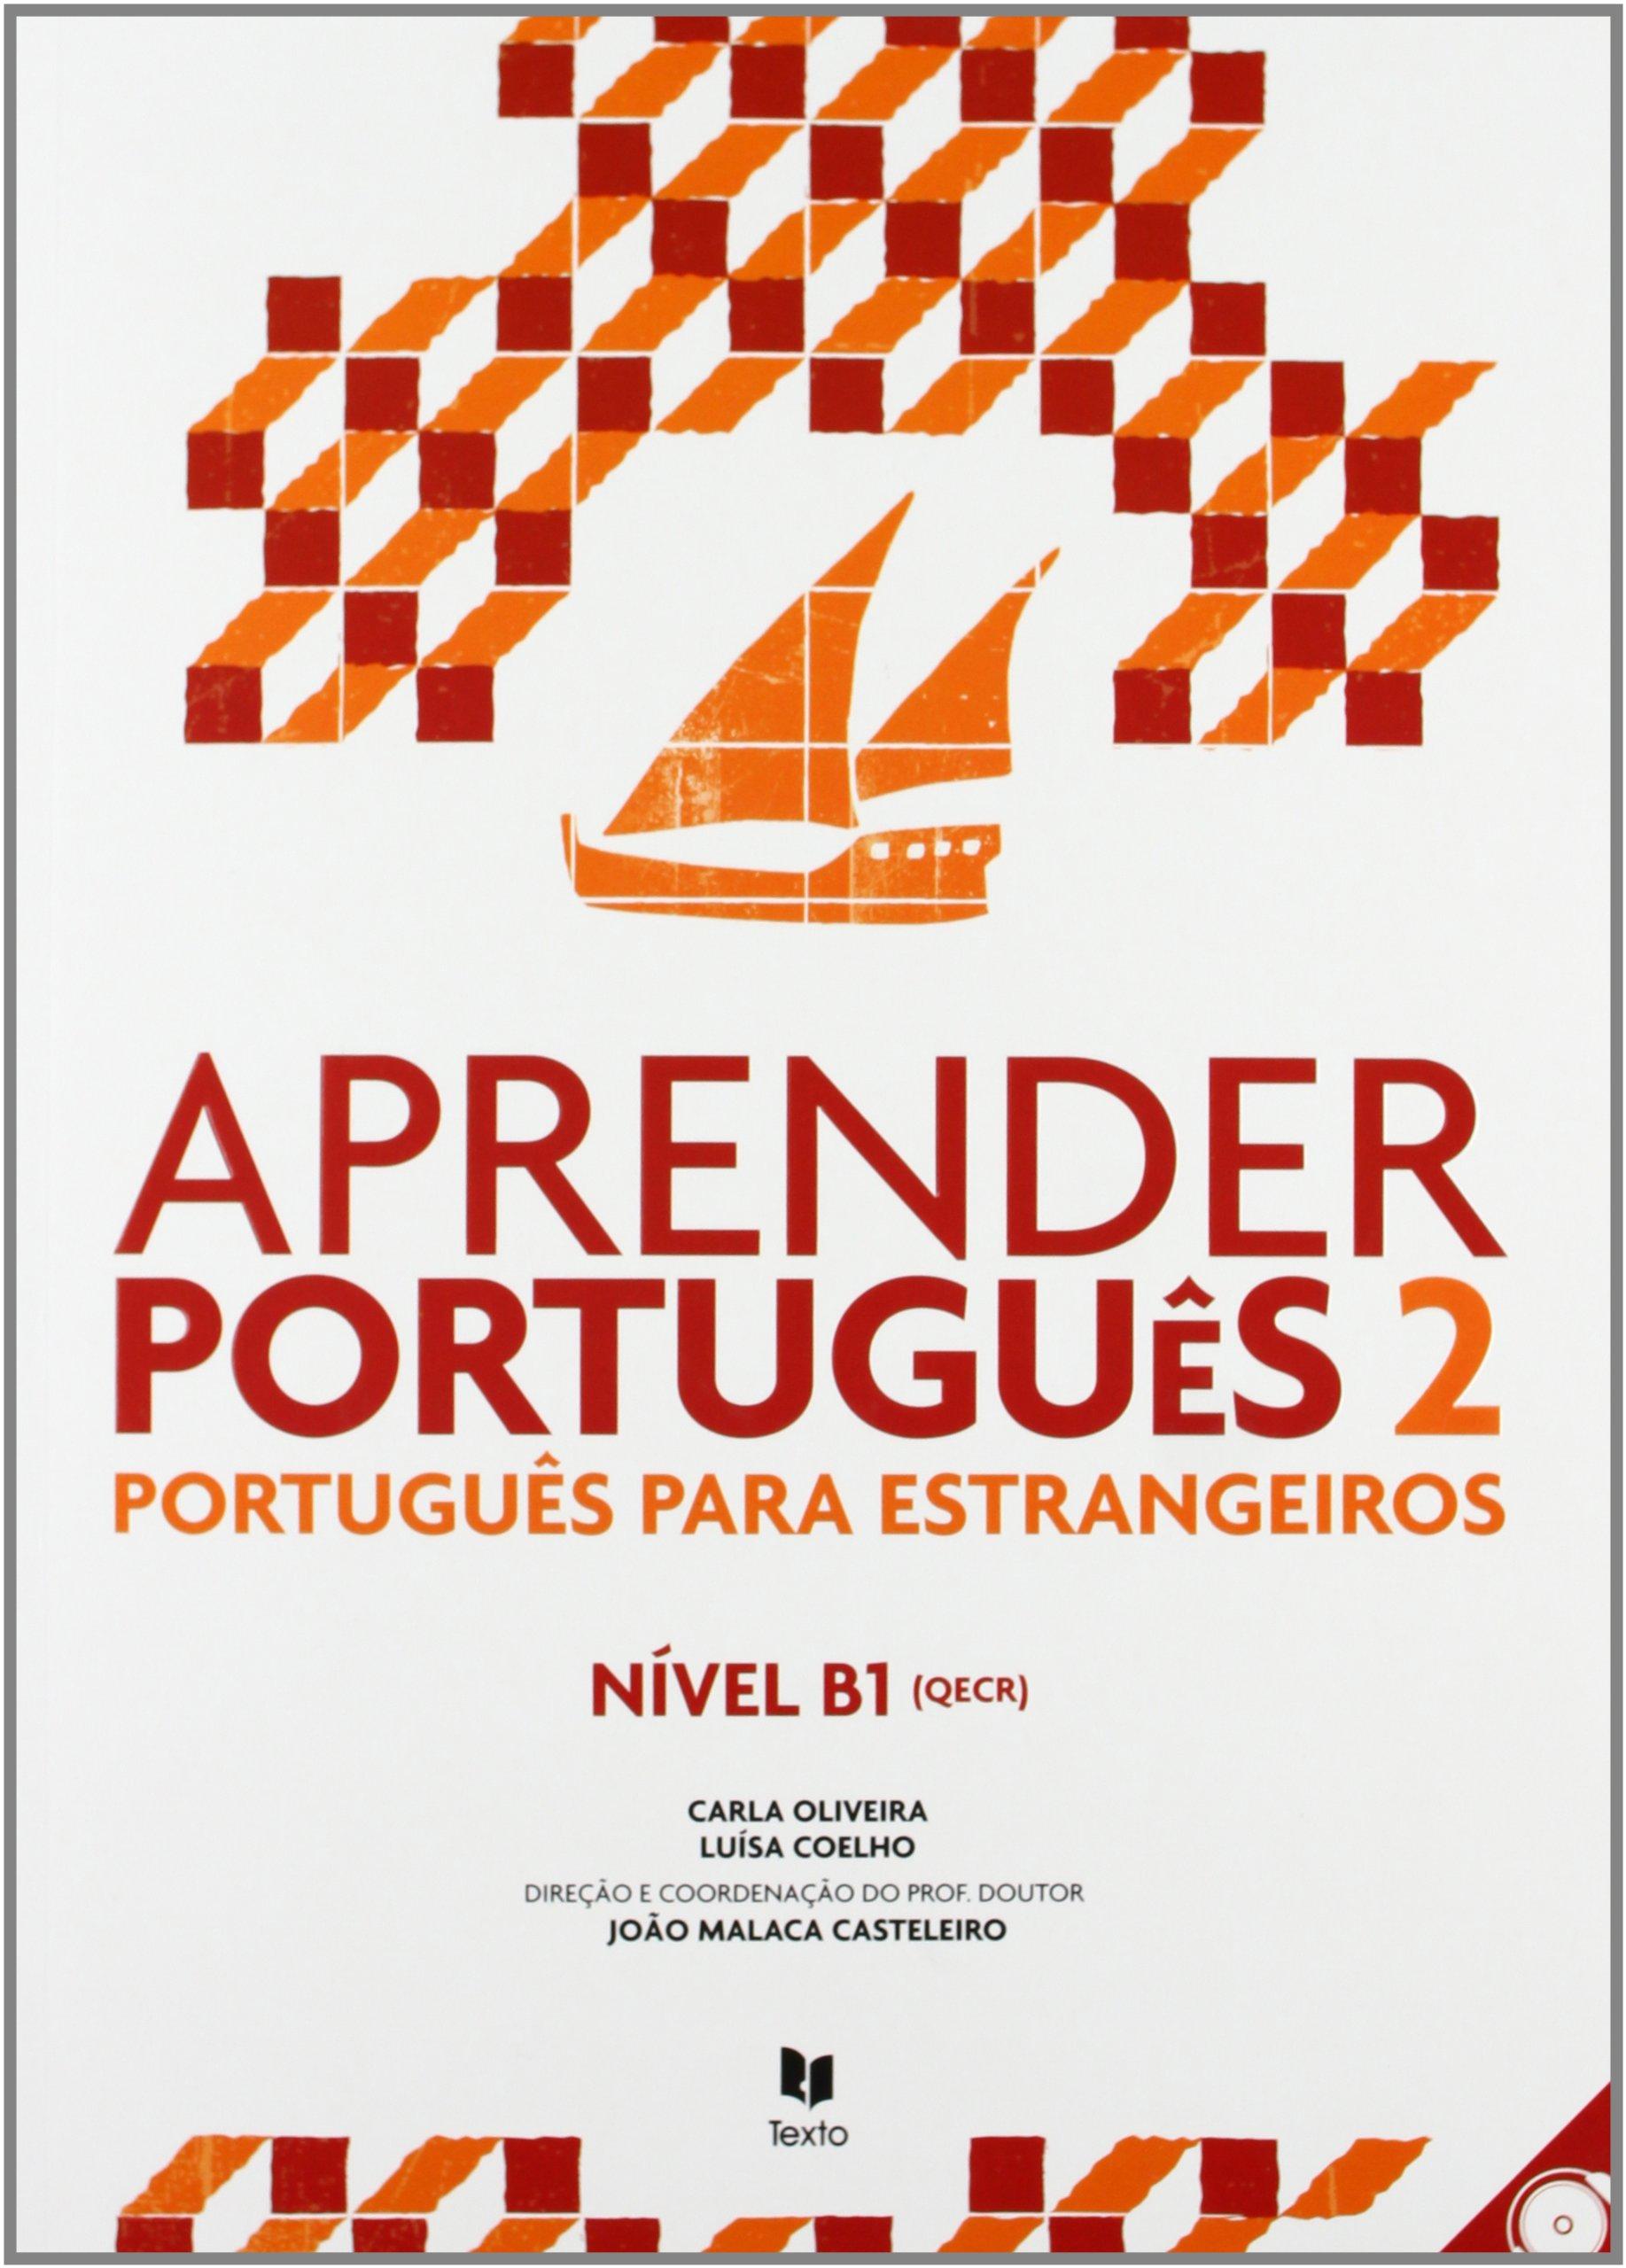 Aprender Portugues Aprender Portugues 2 Pack Manual Com Cd Caderno De Exercicios Amazon De Bücher